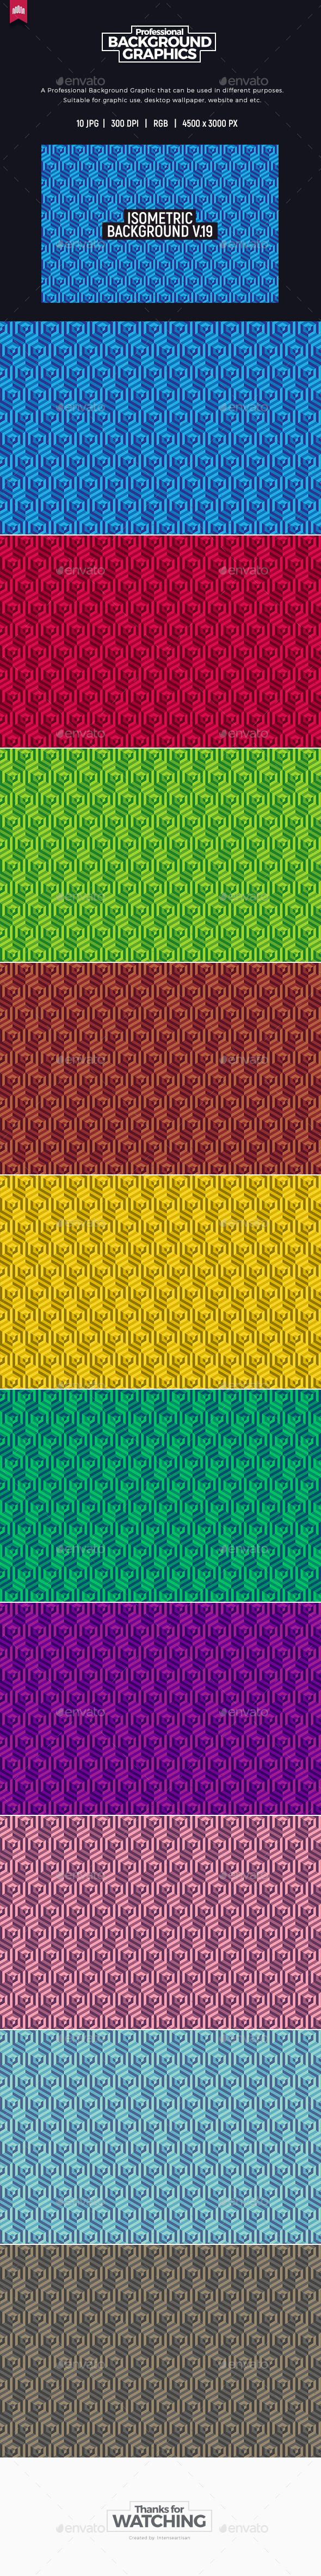 Isometric Background V.19 - Patterns Backgrounds